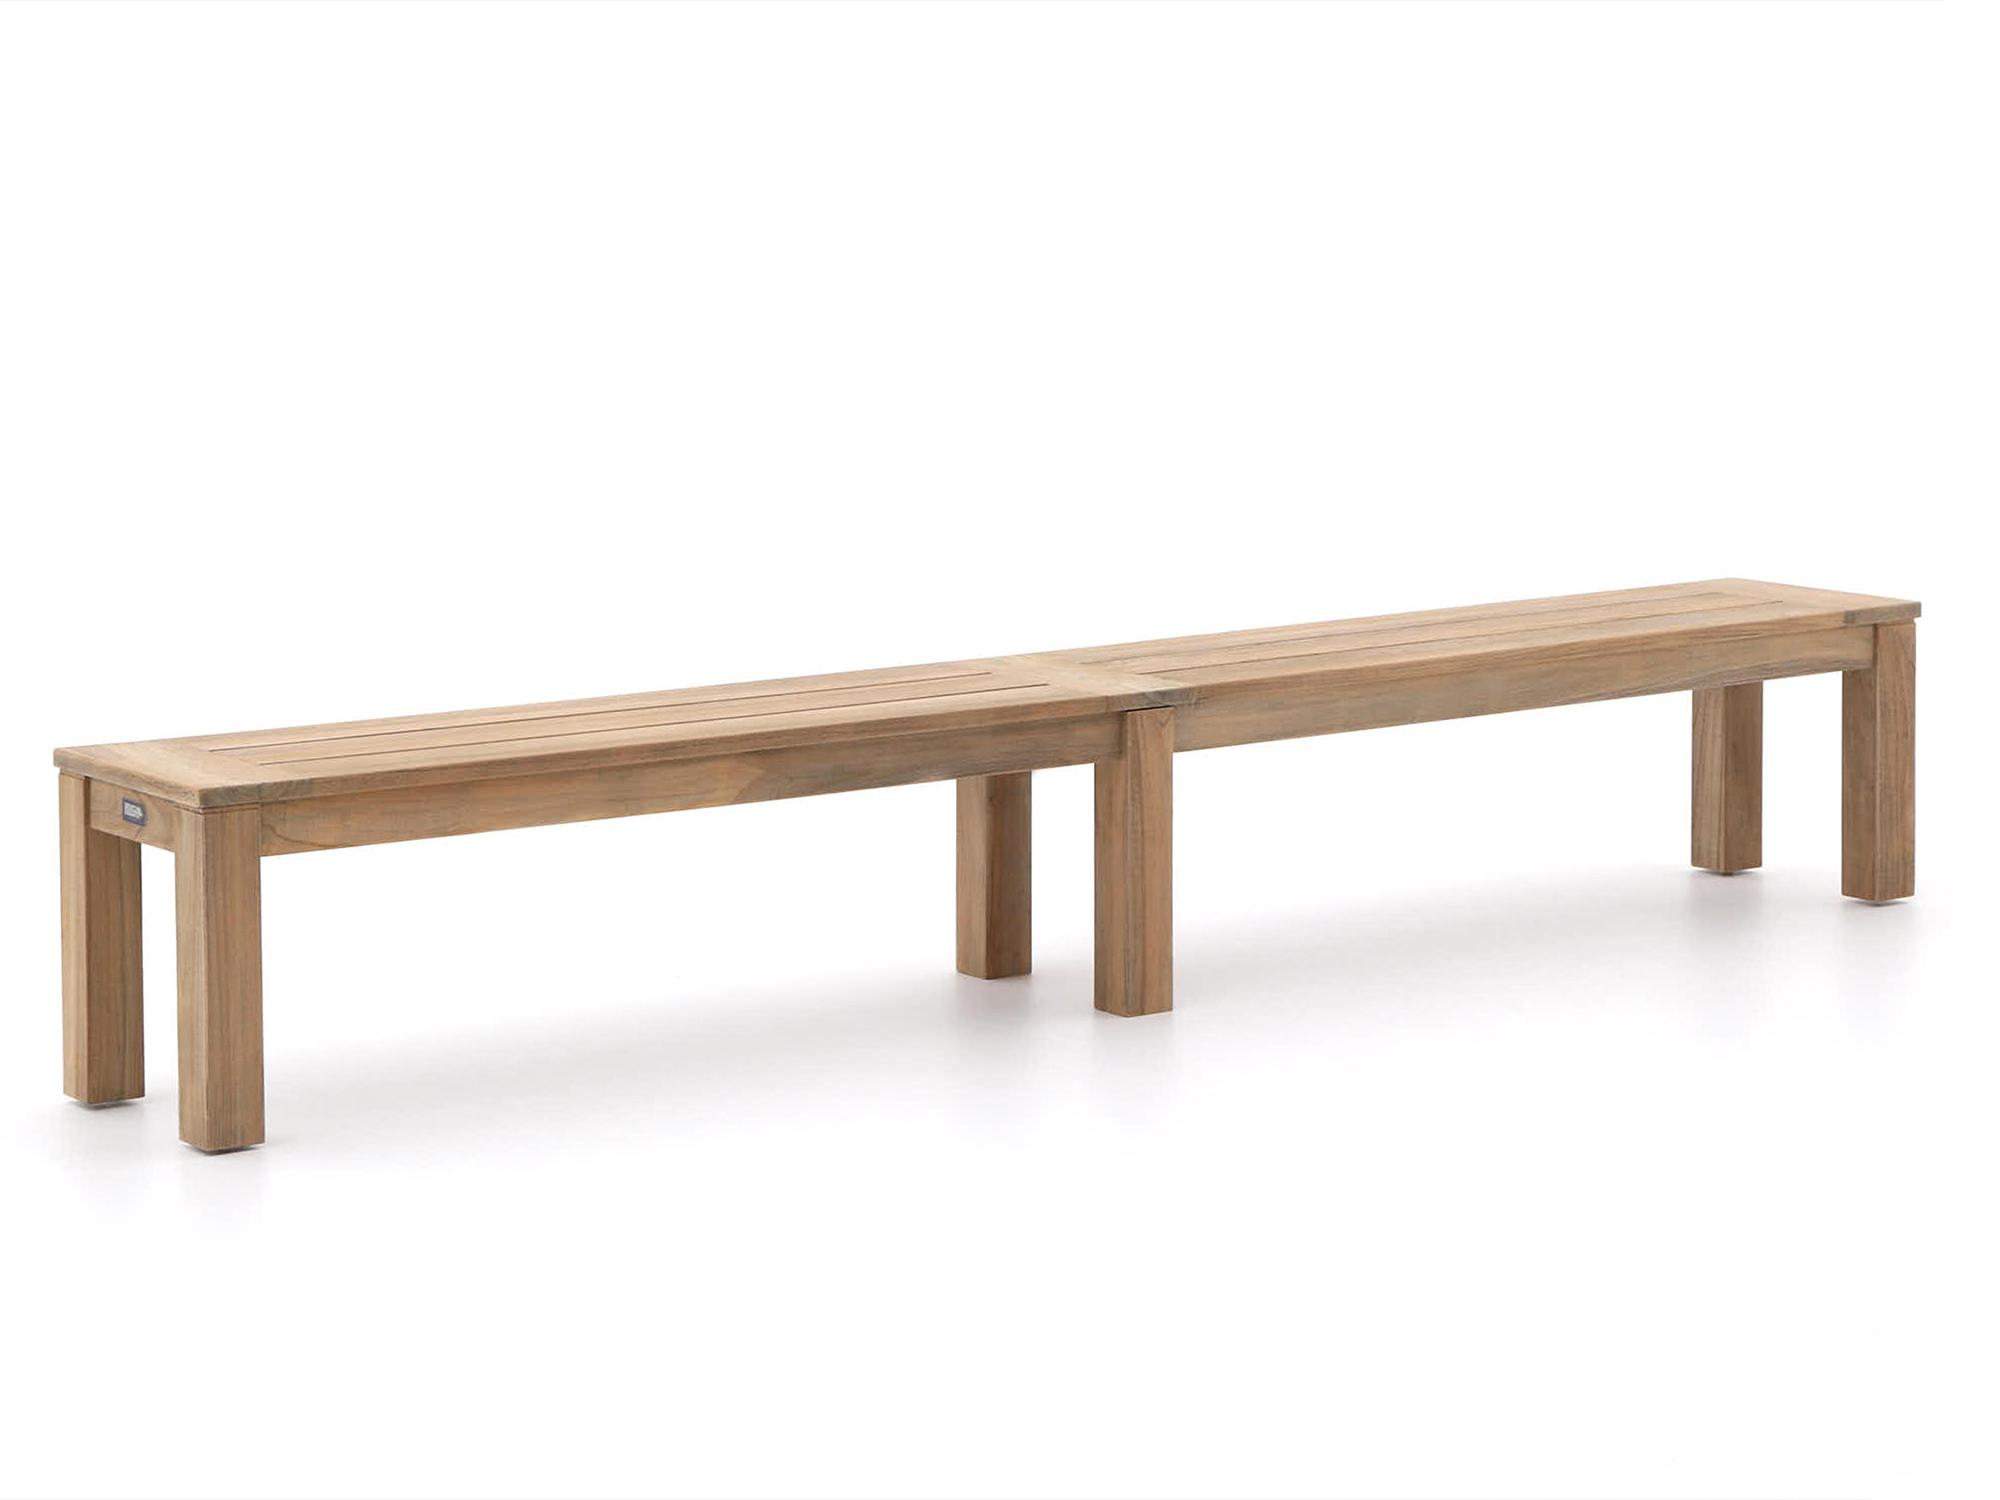 ROUGH-X picknickbank 285x42x45cm - Laagste prijsgarantie!